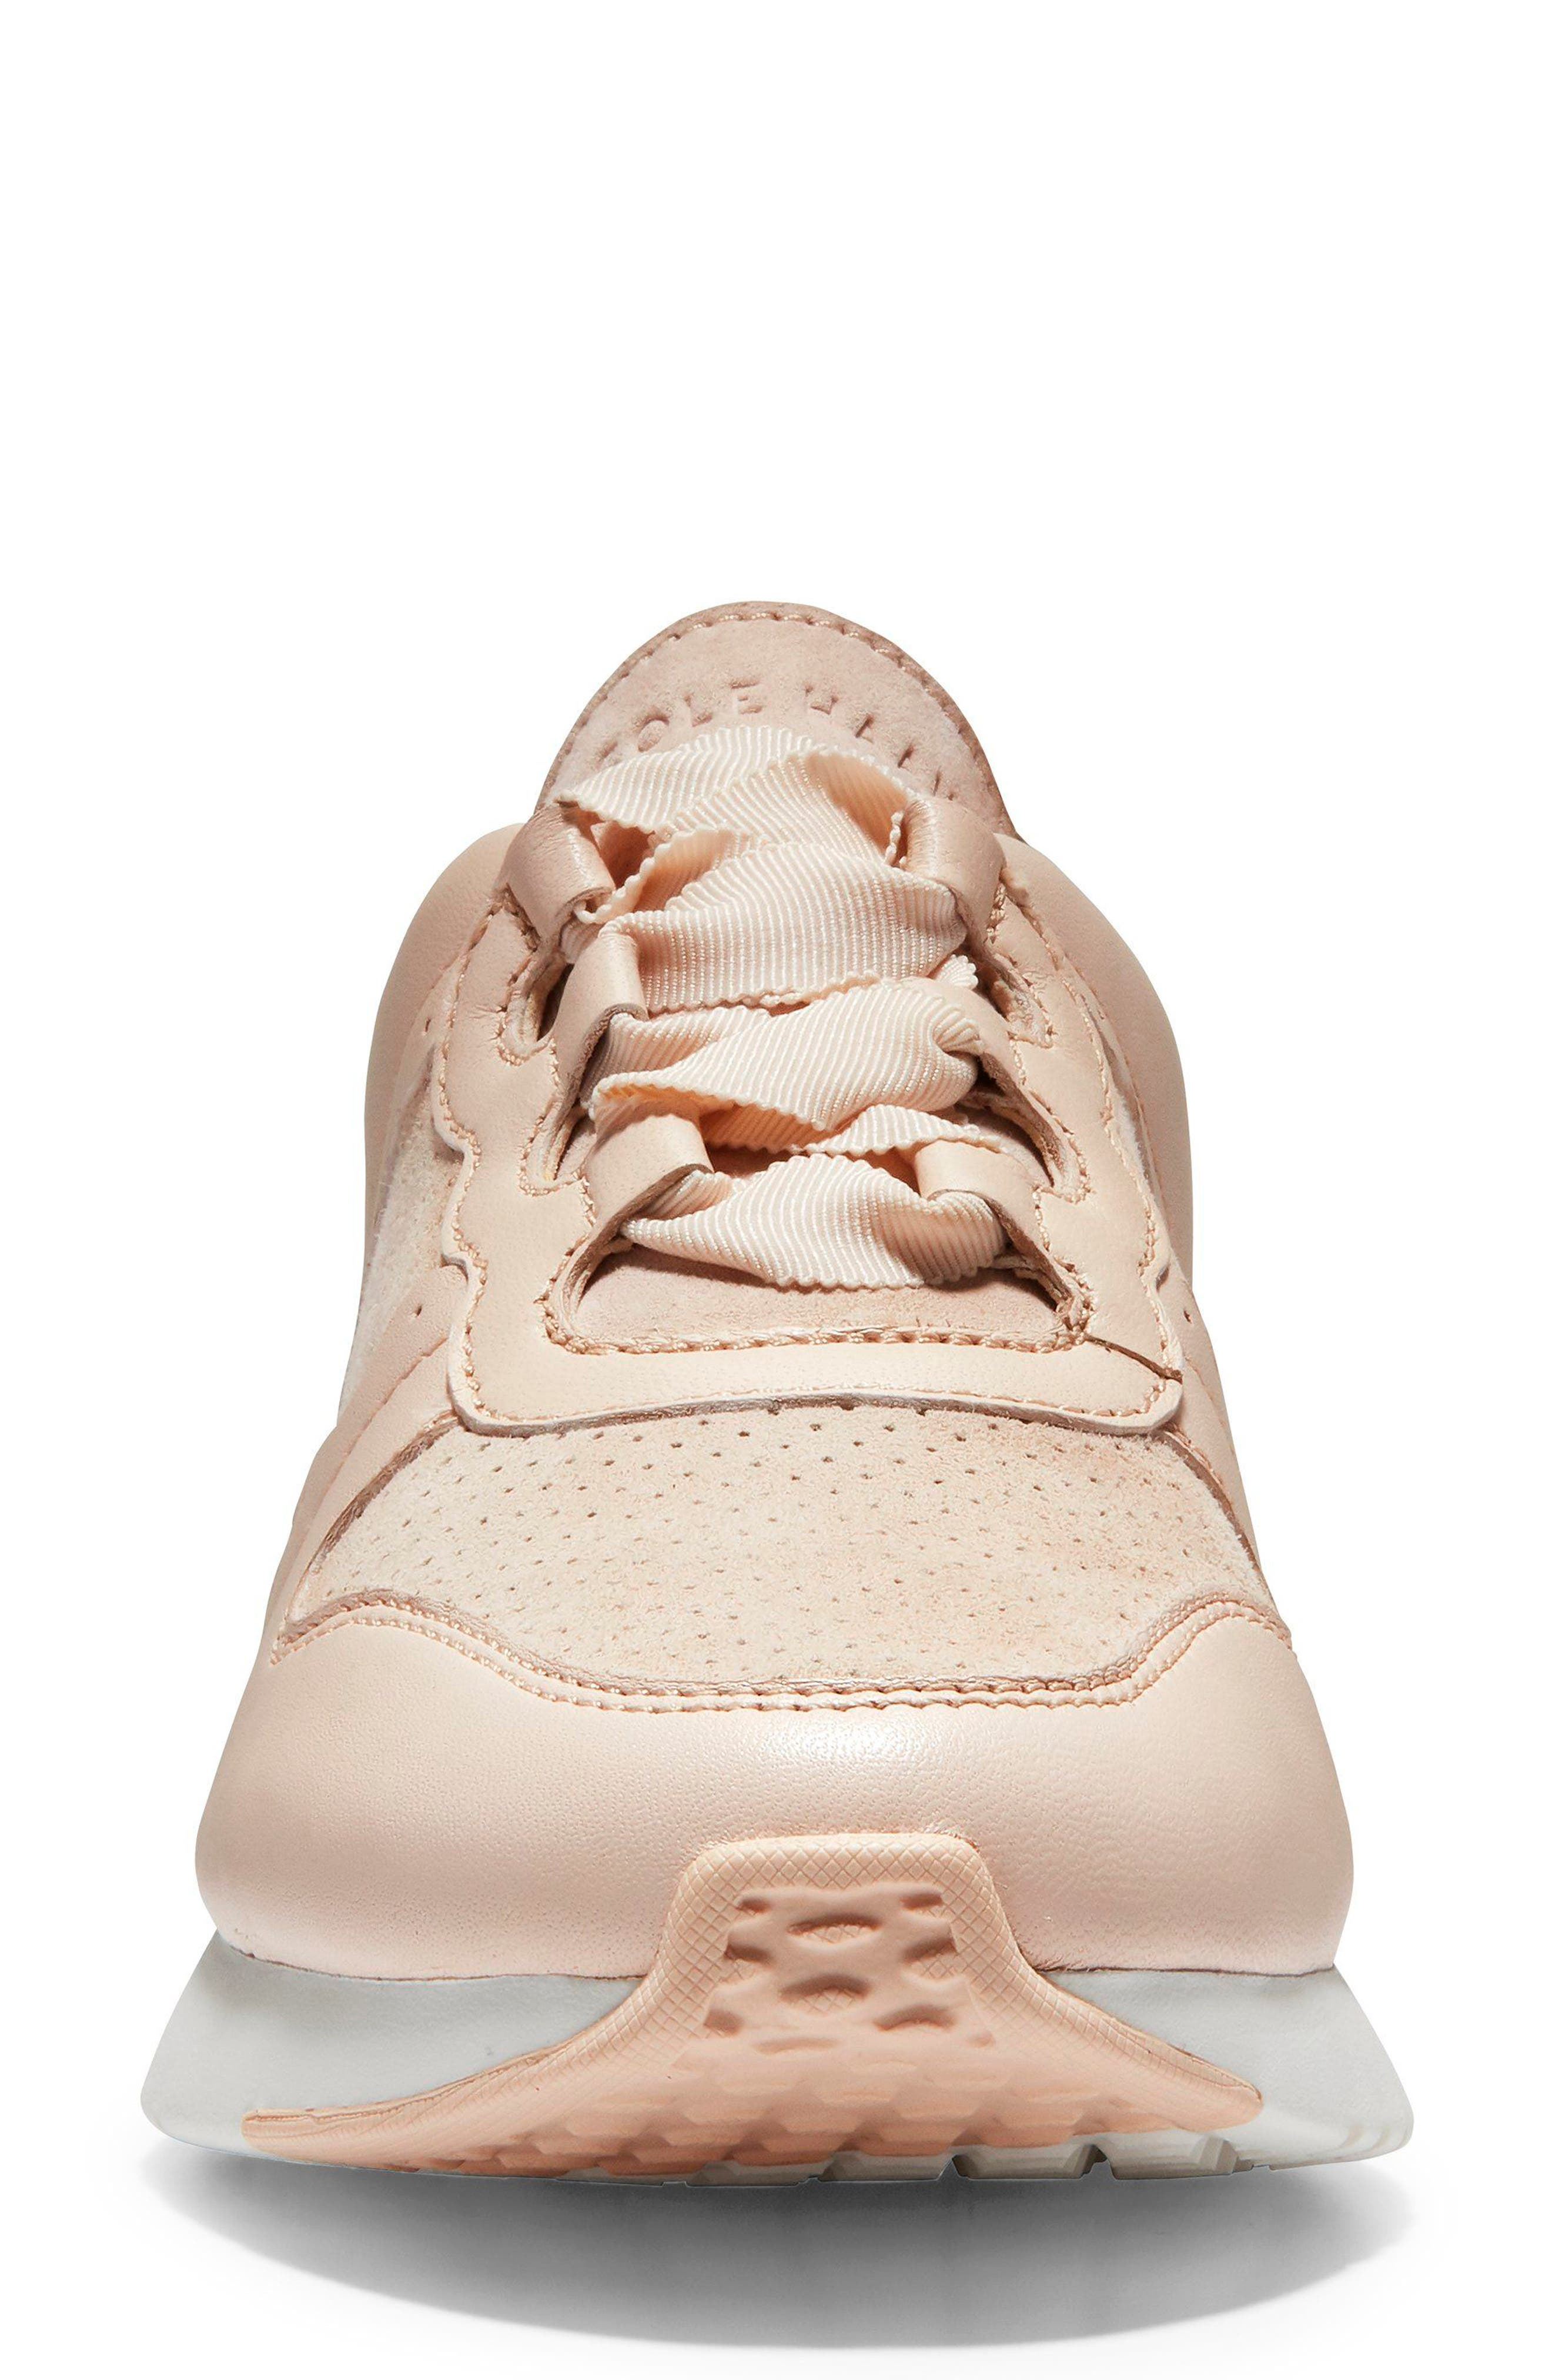 GrandPro Wedge Sneaker,                             Alternate thumbnail 4, color,                             Peach Blush Suede